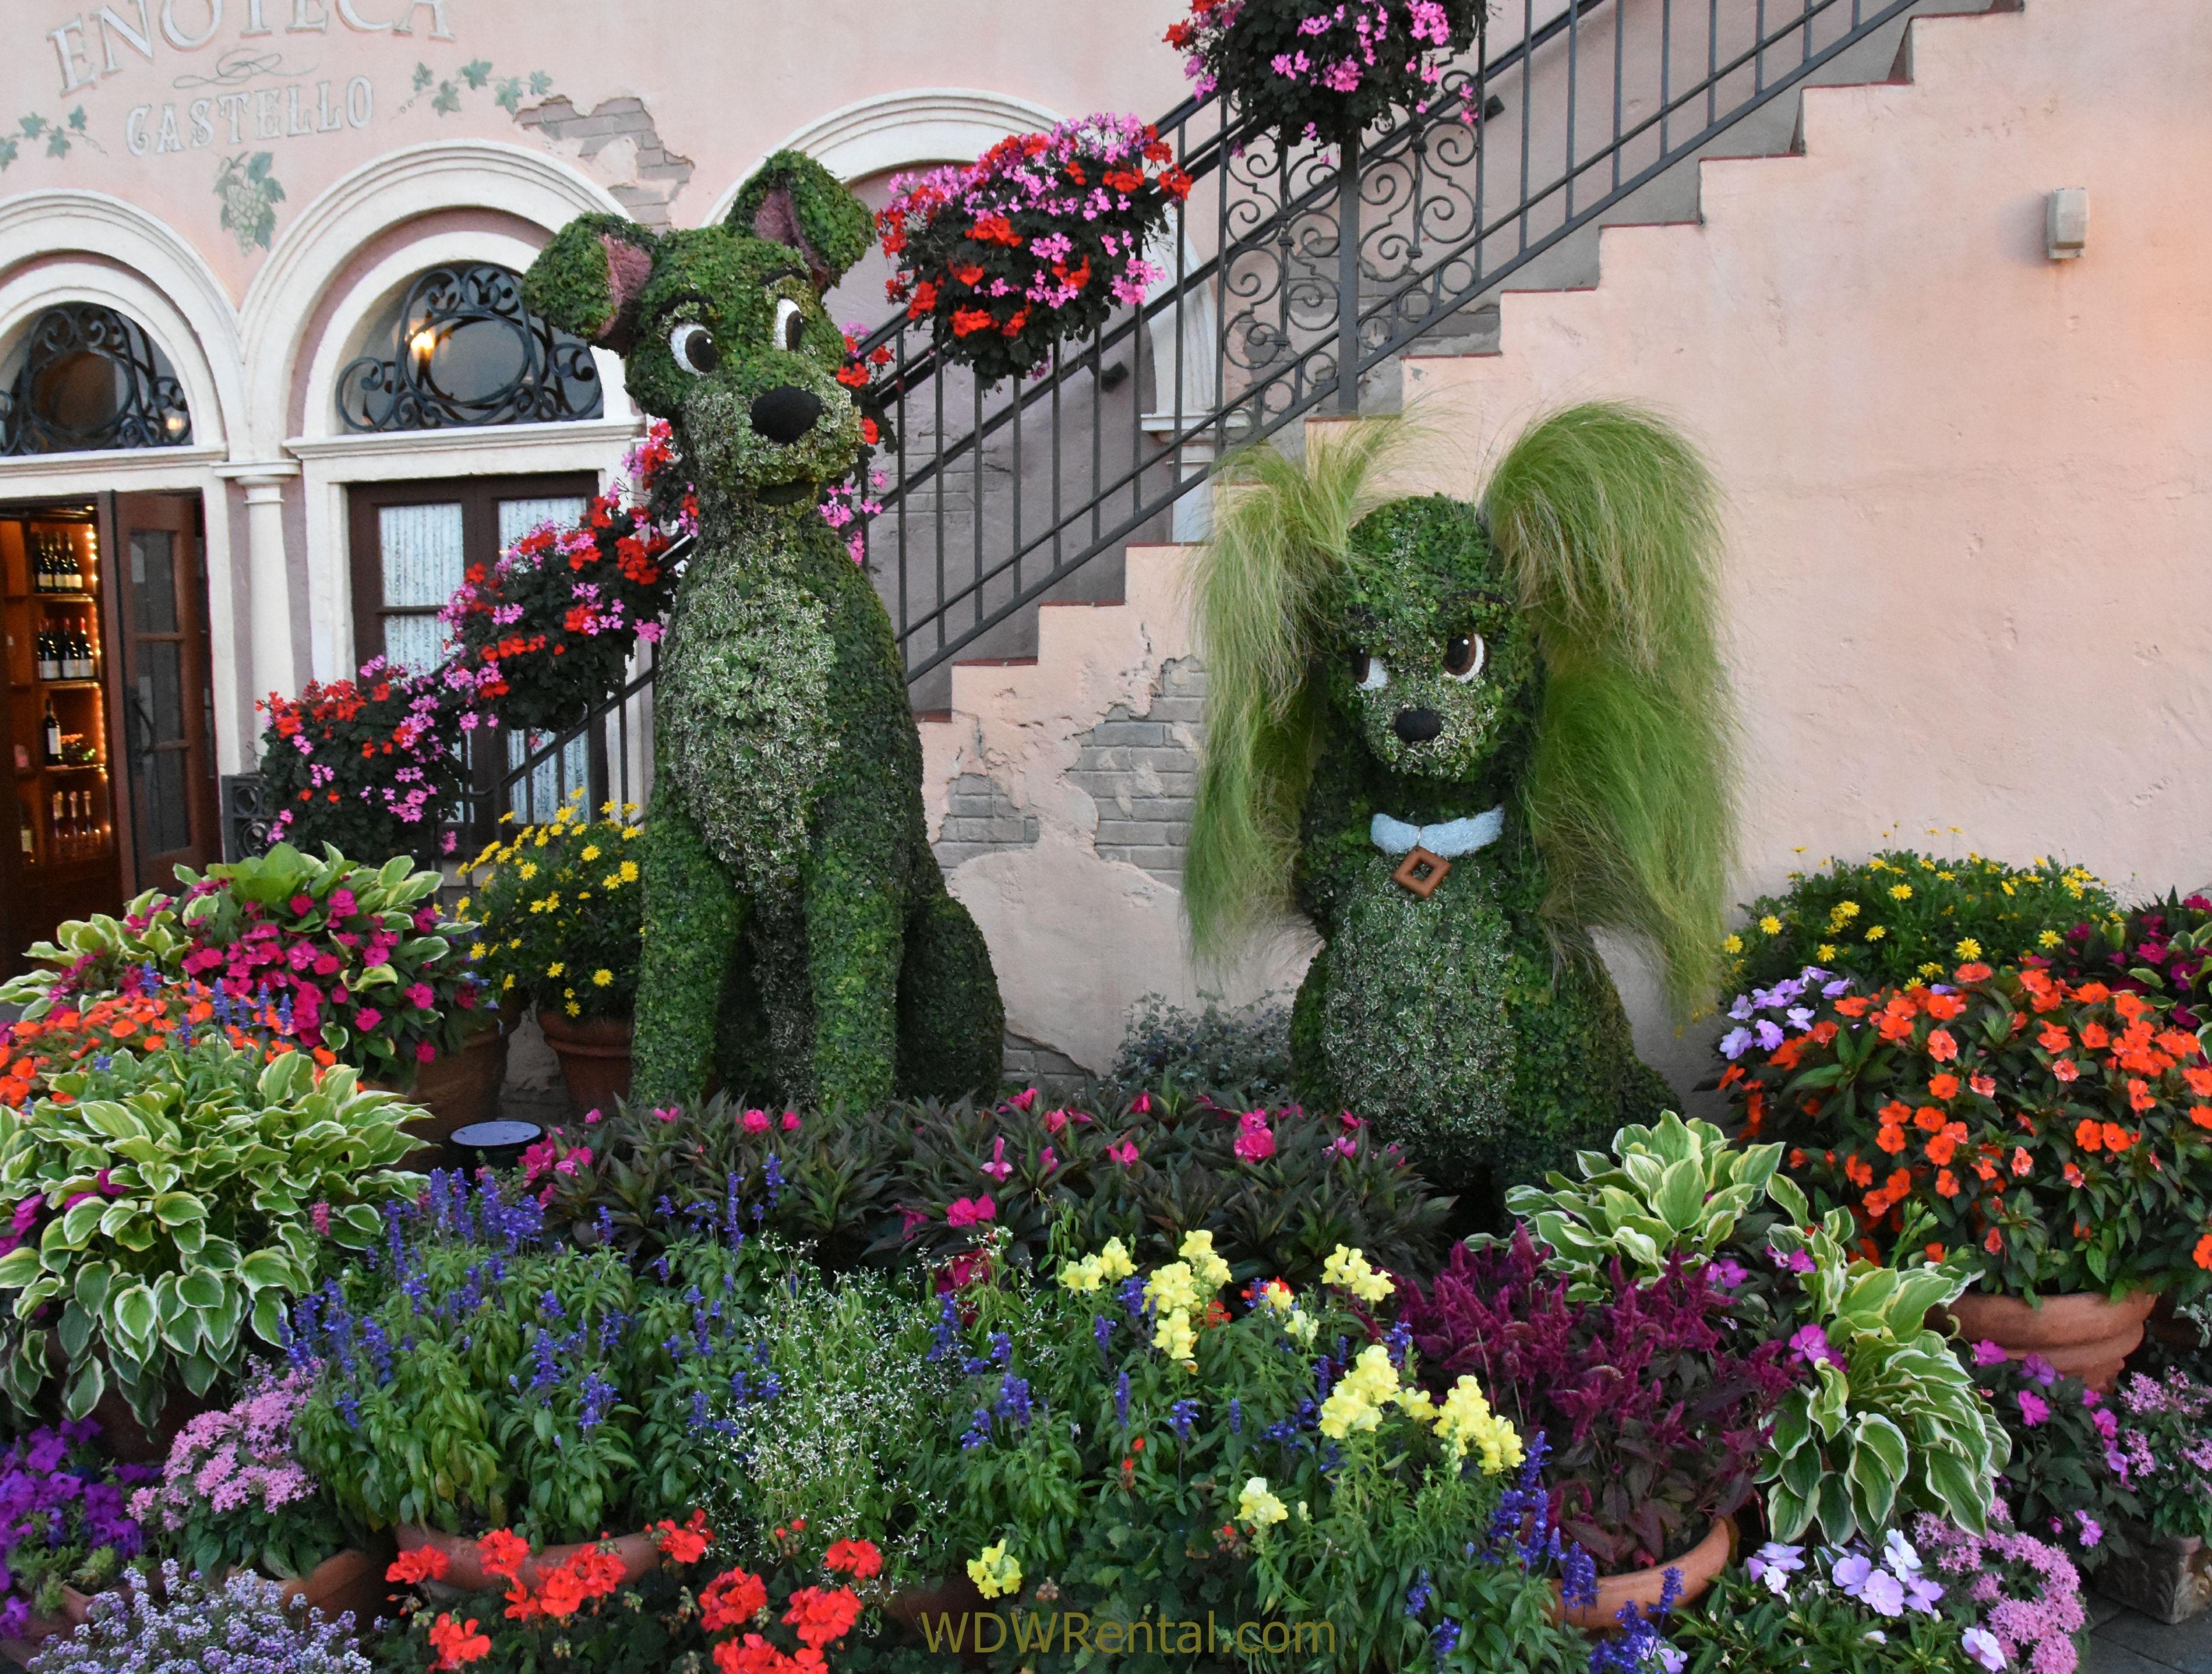 epcot flower and garden show 25th anniversary 2018. walt disney